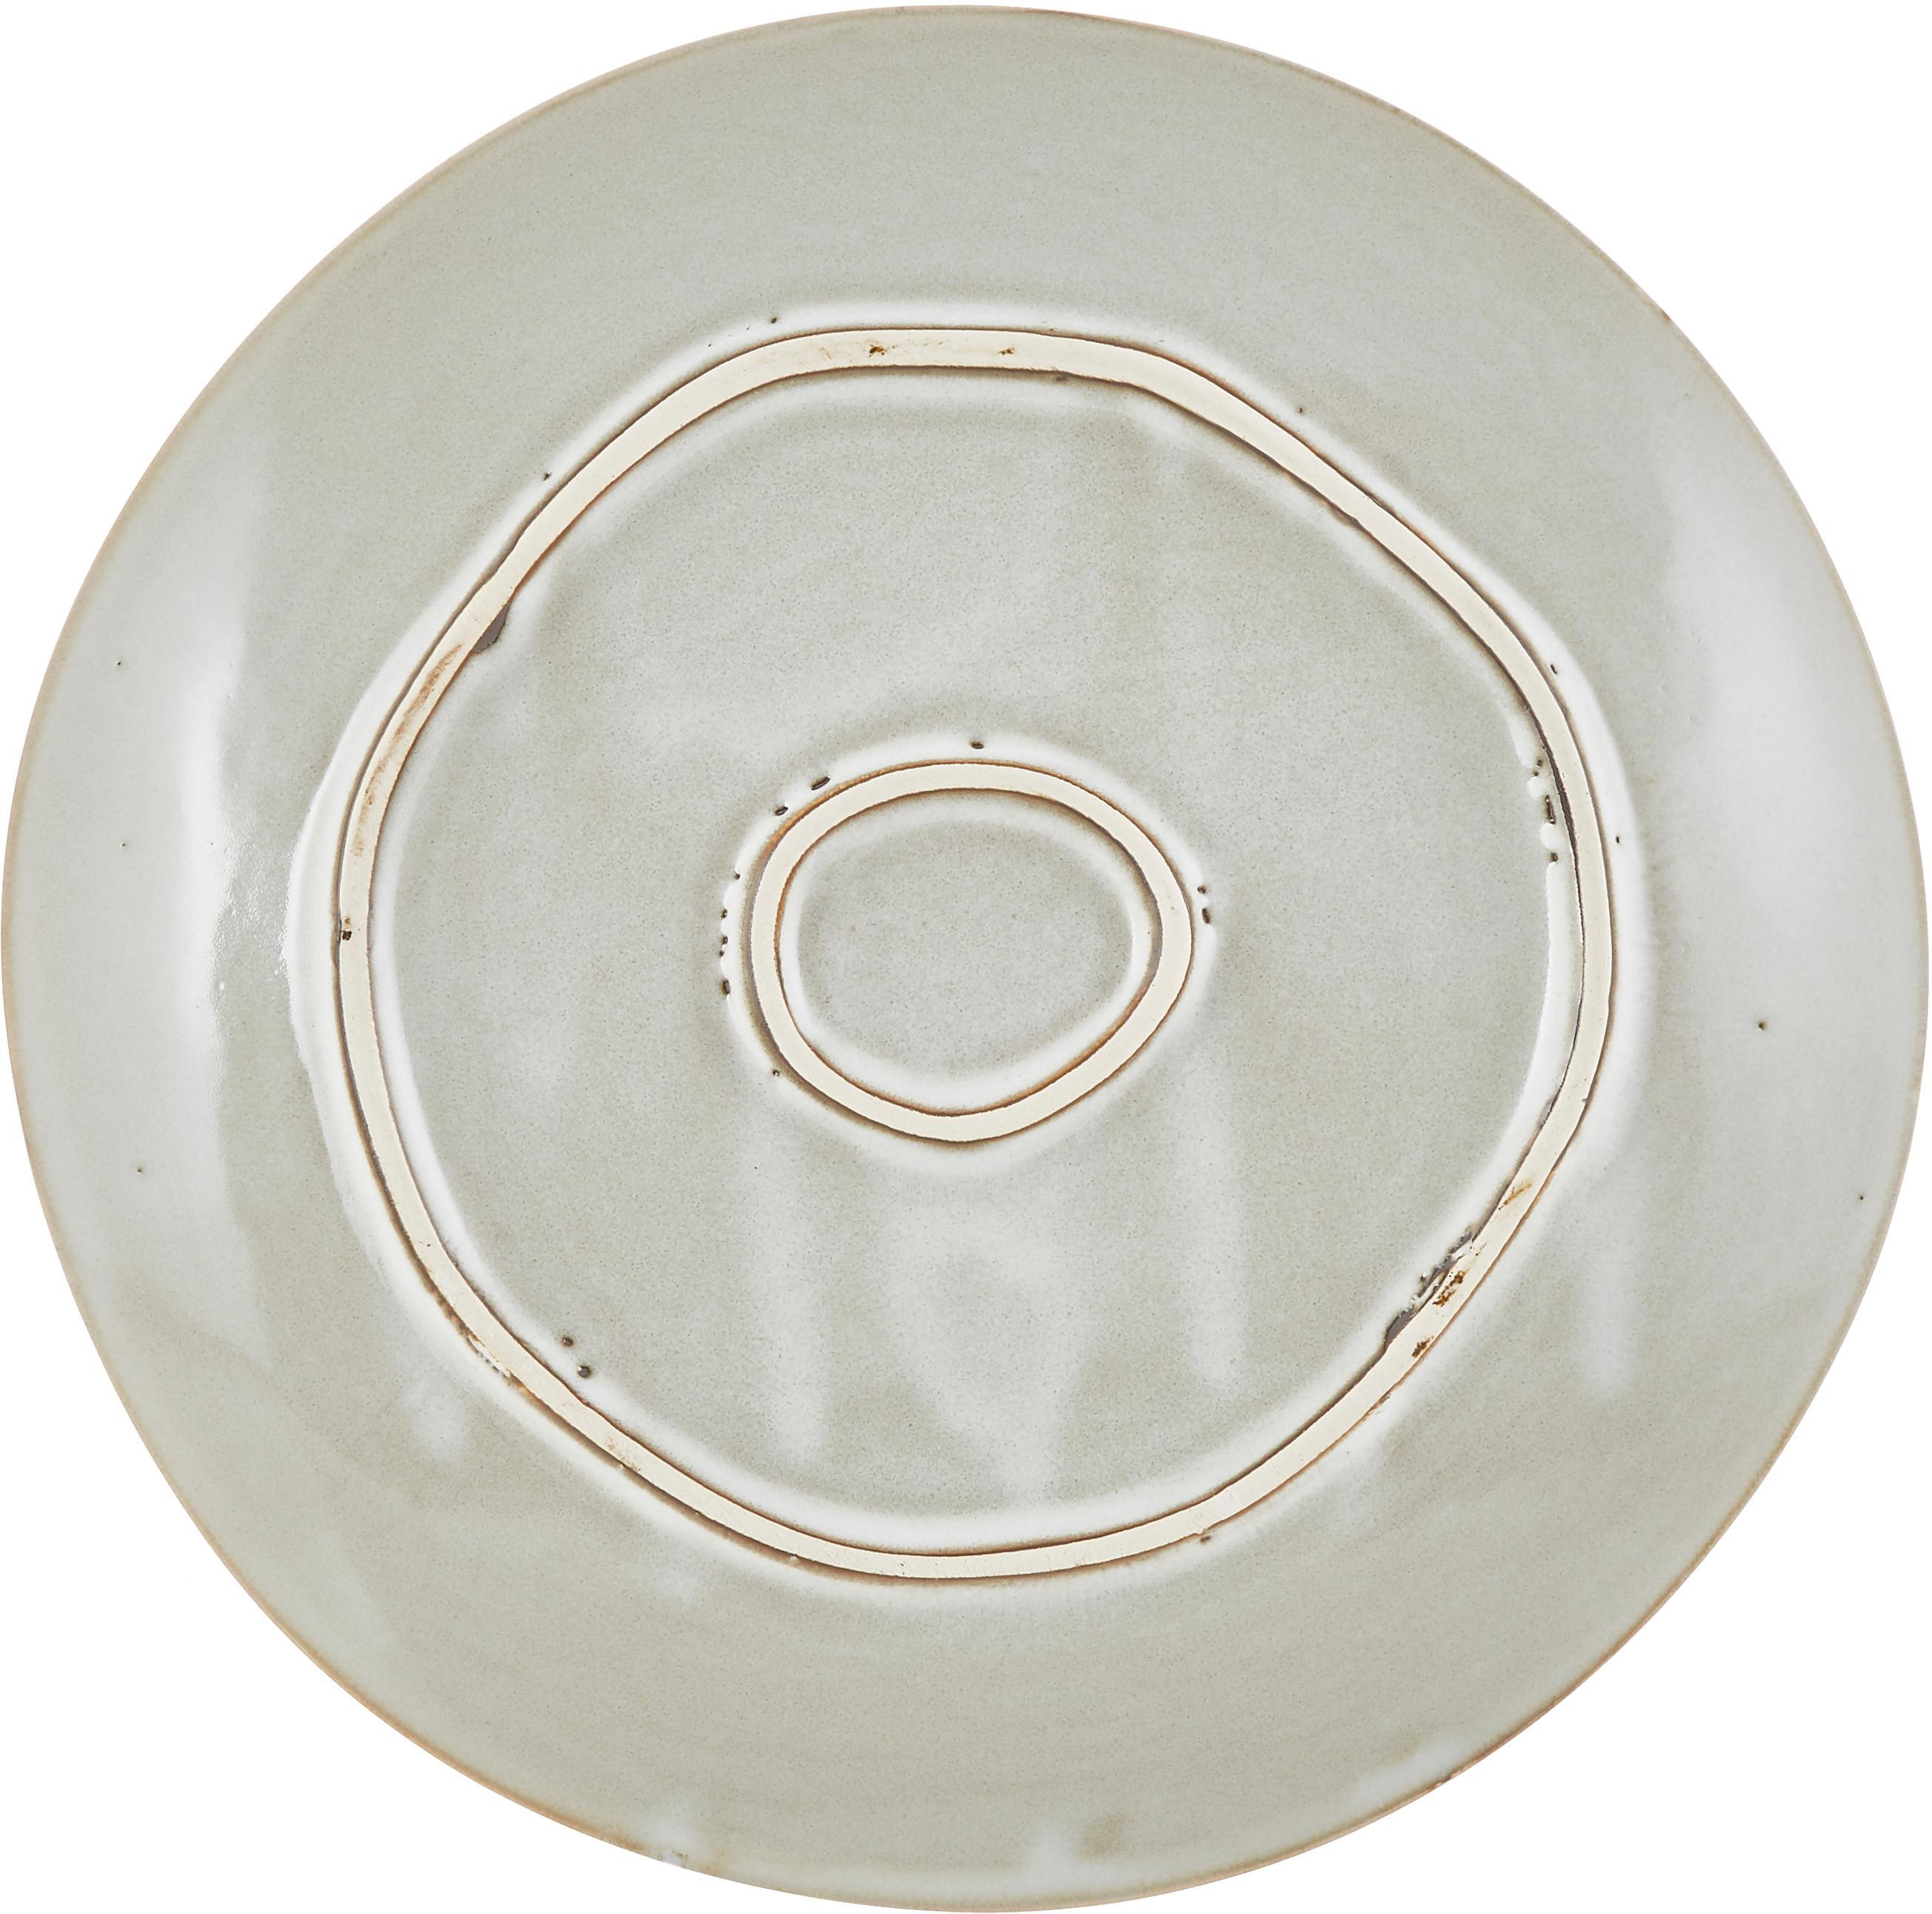 Platos postre artesanales Thalia, 2uds., Gres, Beige, Ø 22 cm